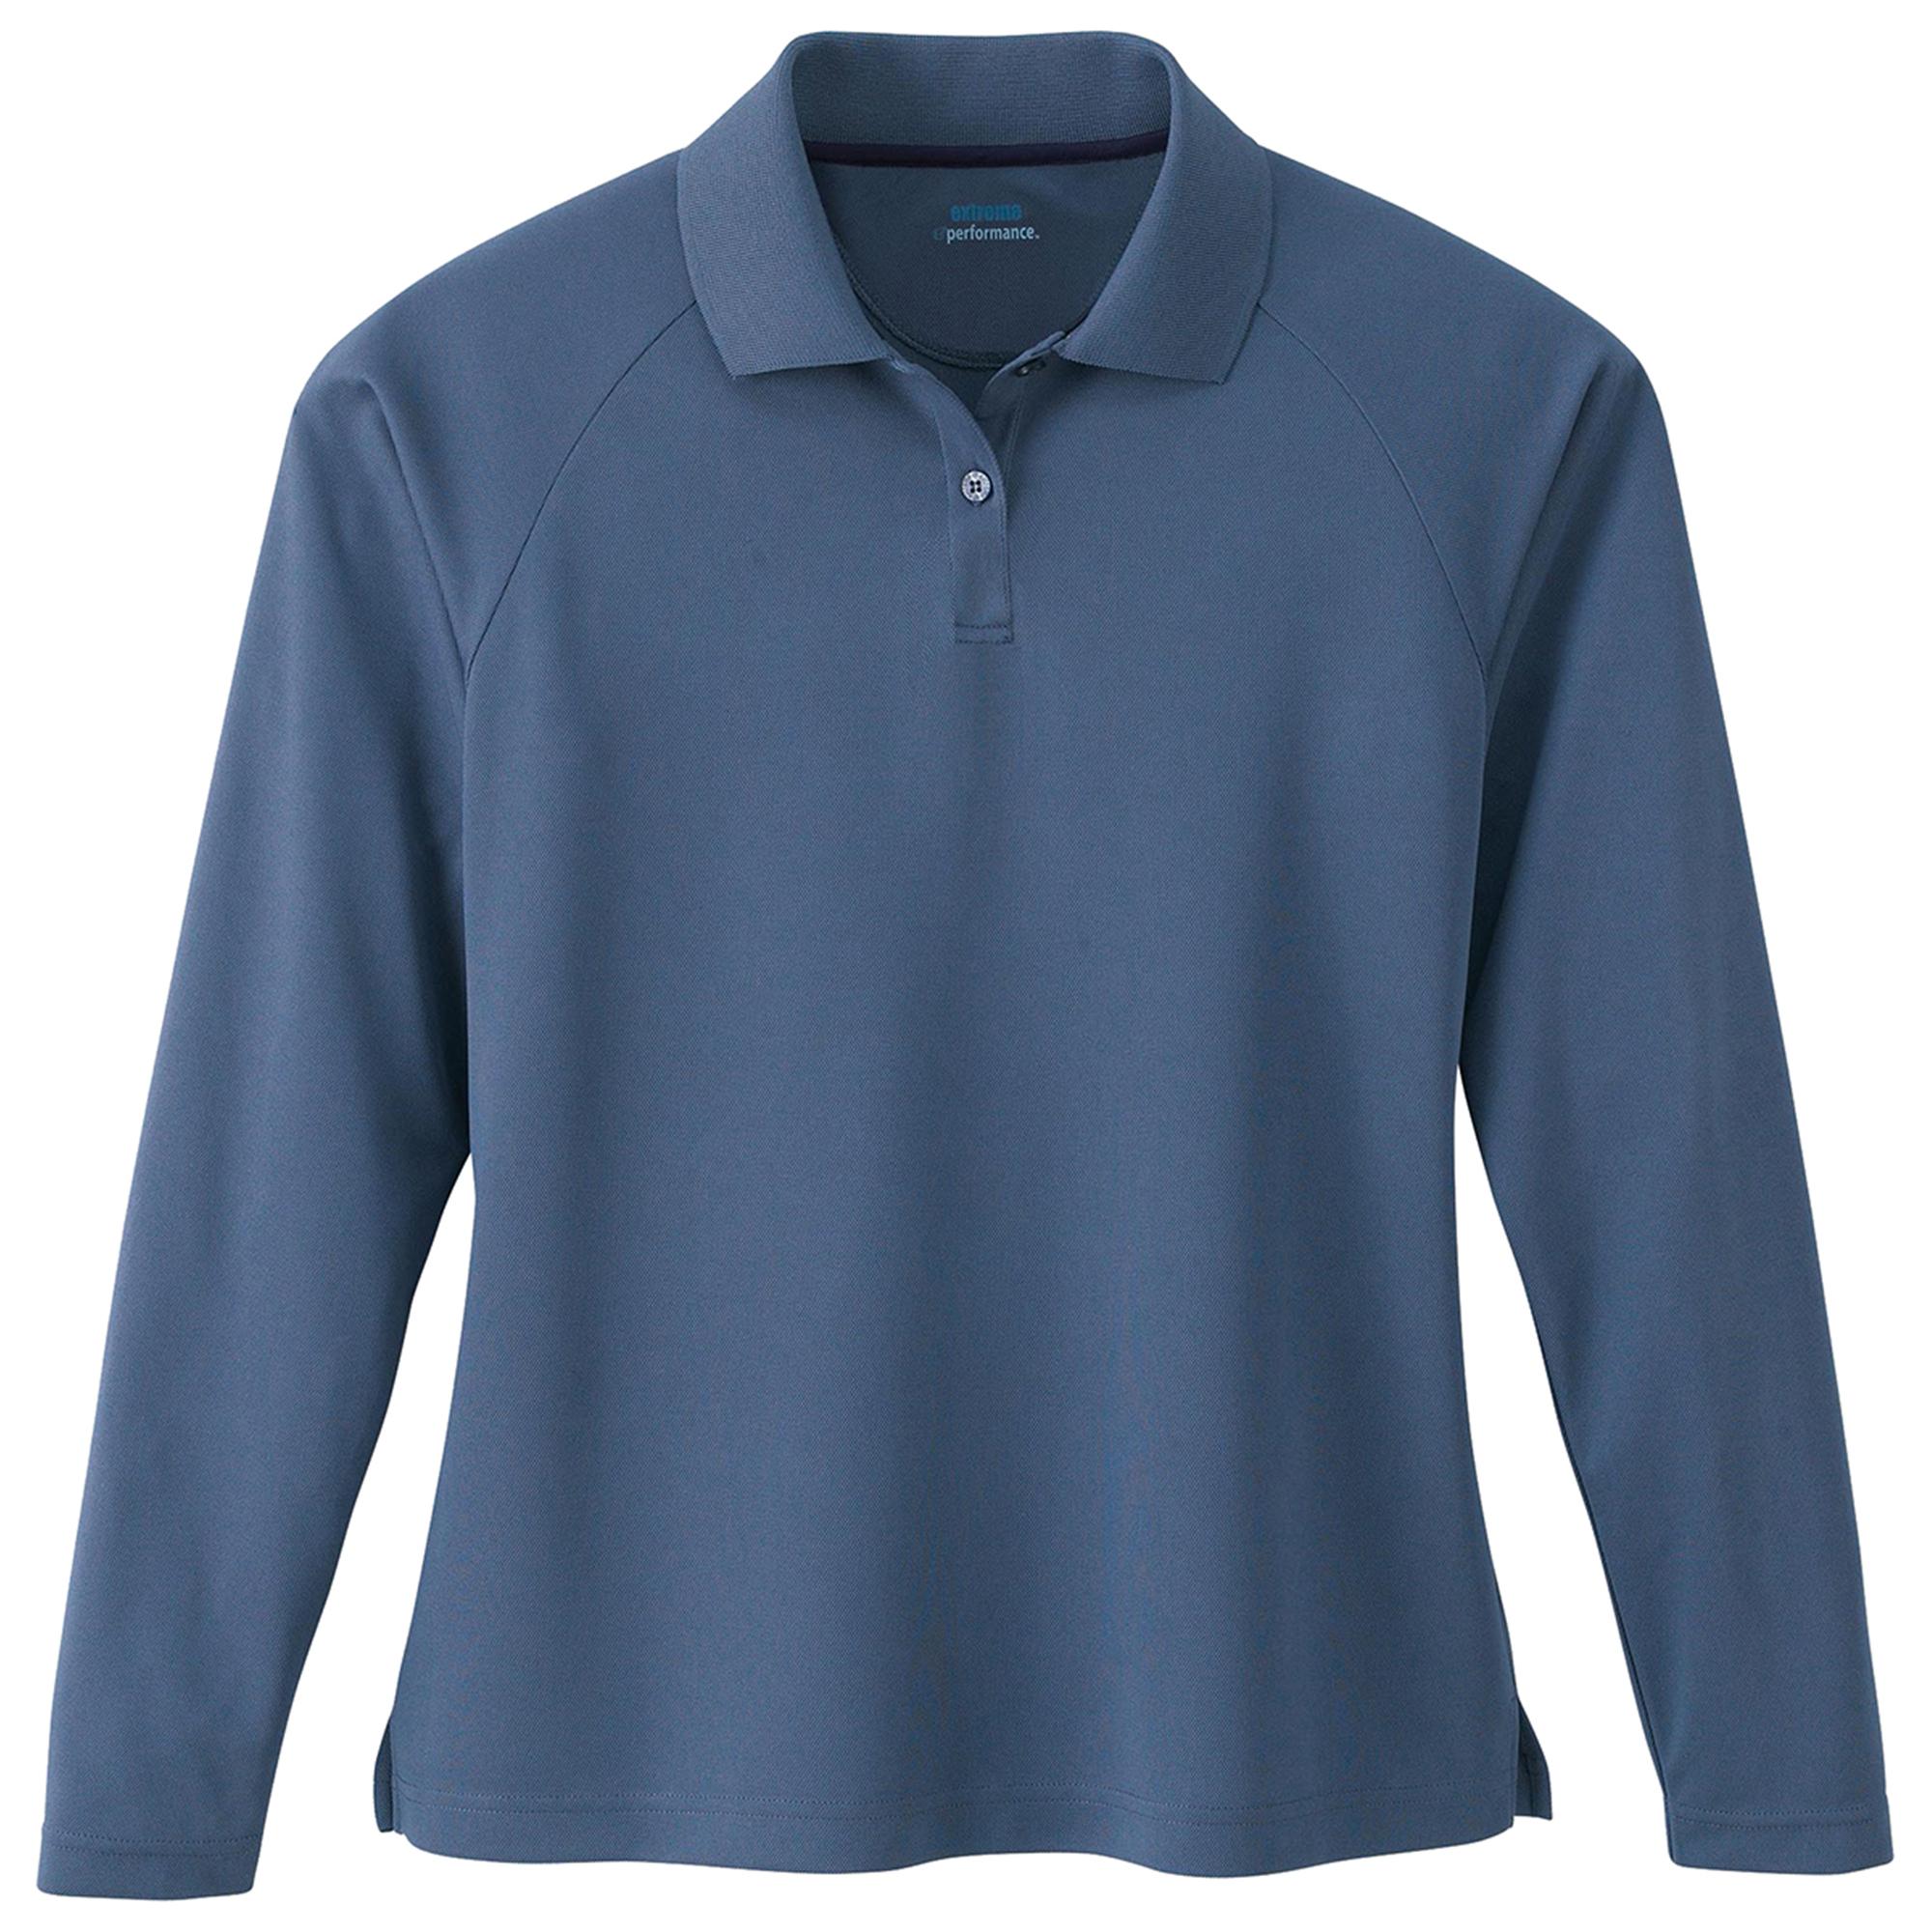 Extreme 75061 Women's Long Sleeve Knit Collar Polo Shirt